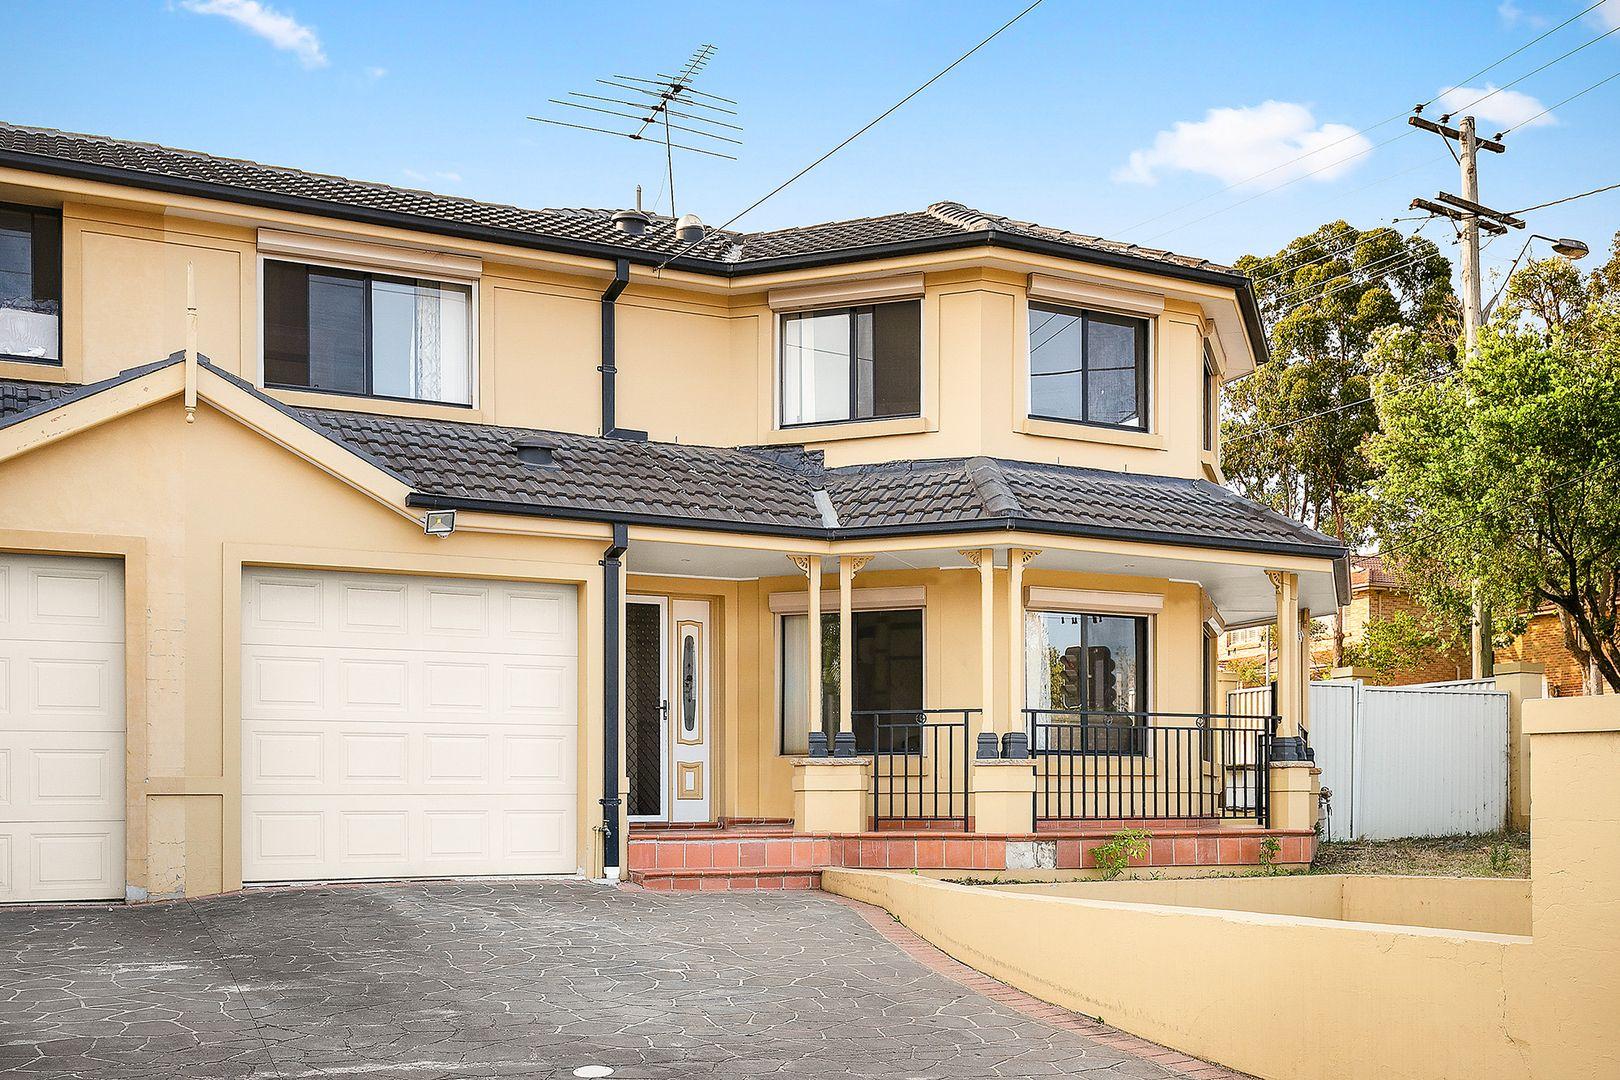 1/110 Targo Road, Girraween NSW 2145, Image 0